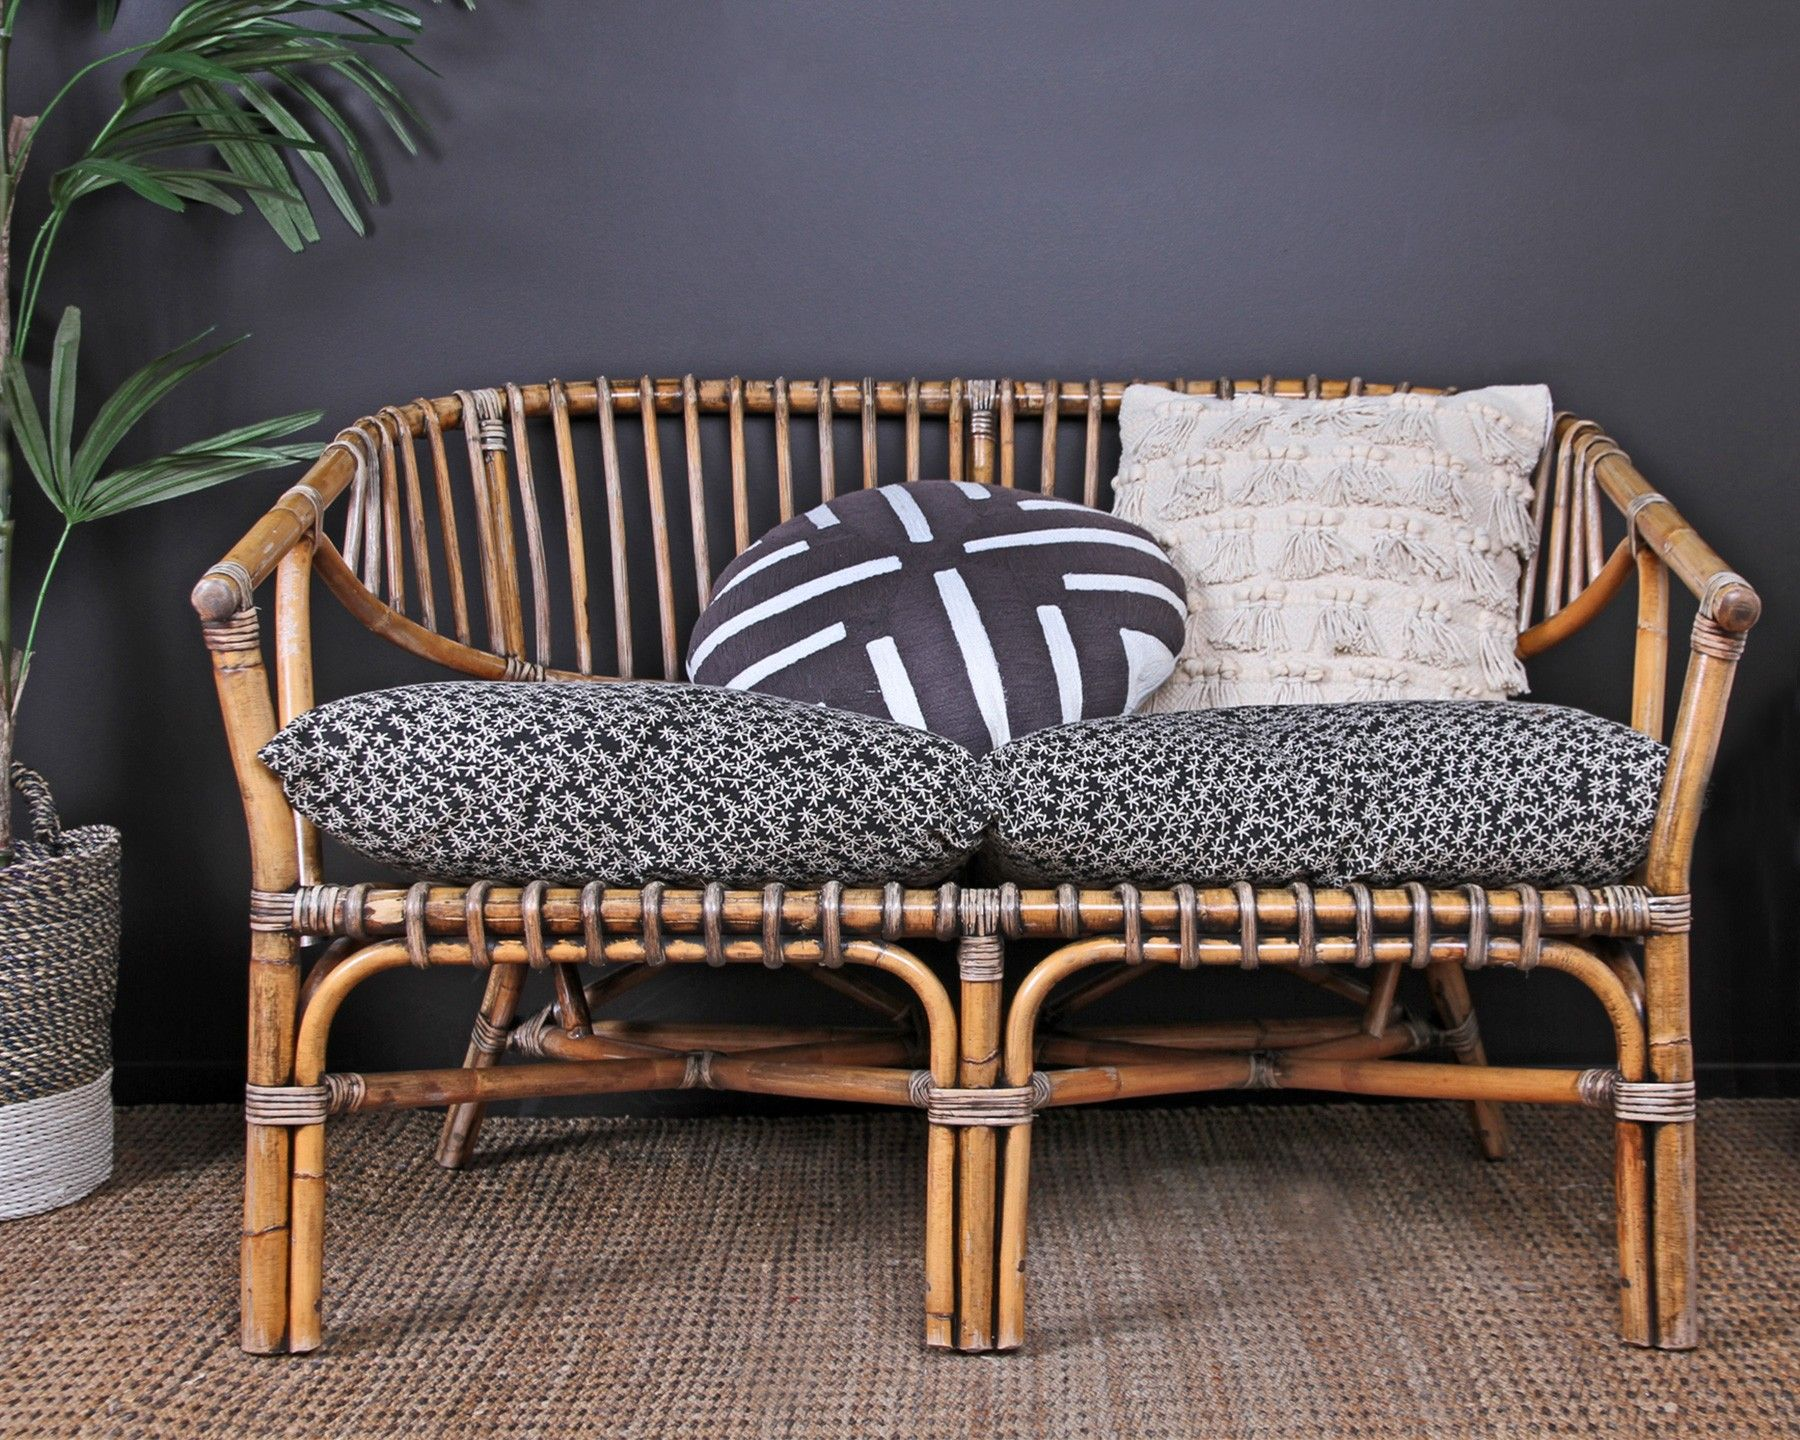 Spaghetti Chair 2S Low - Patio Seating - Patio | Vast